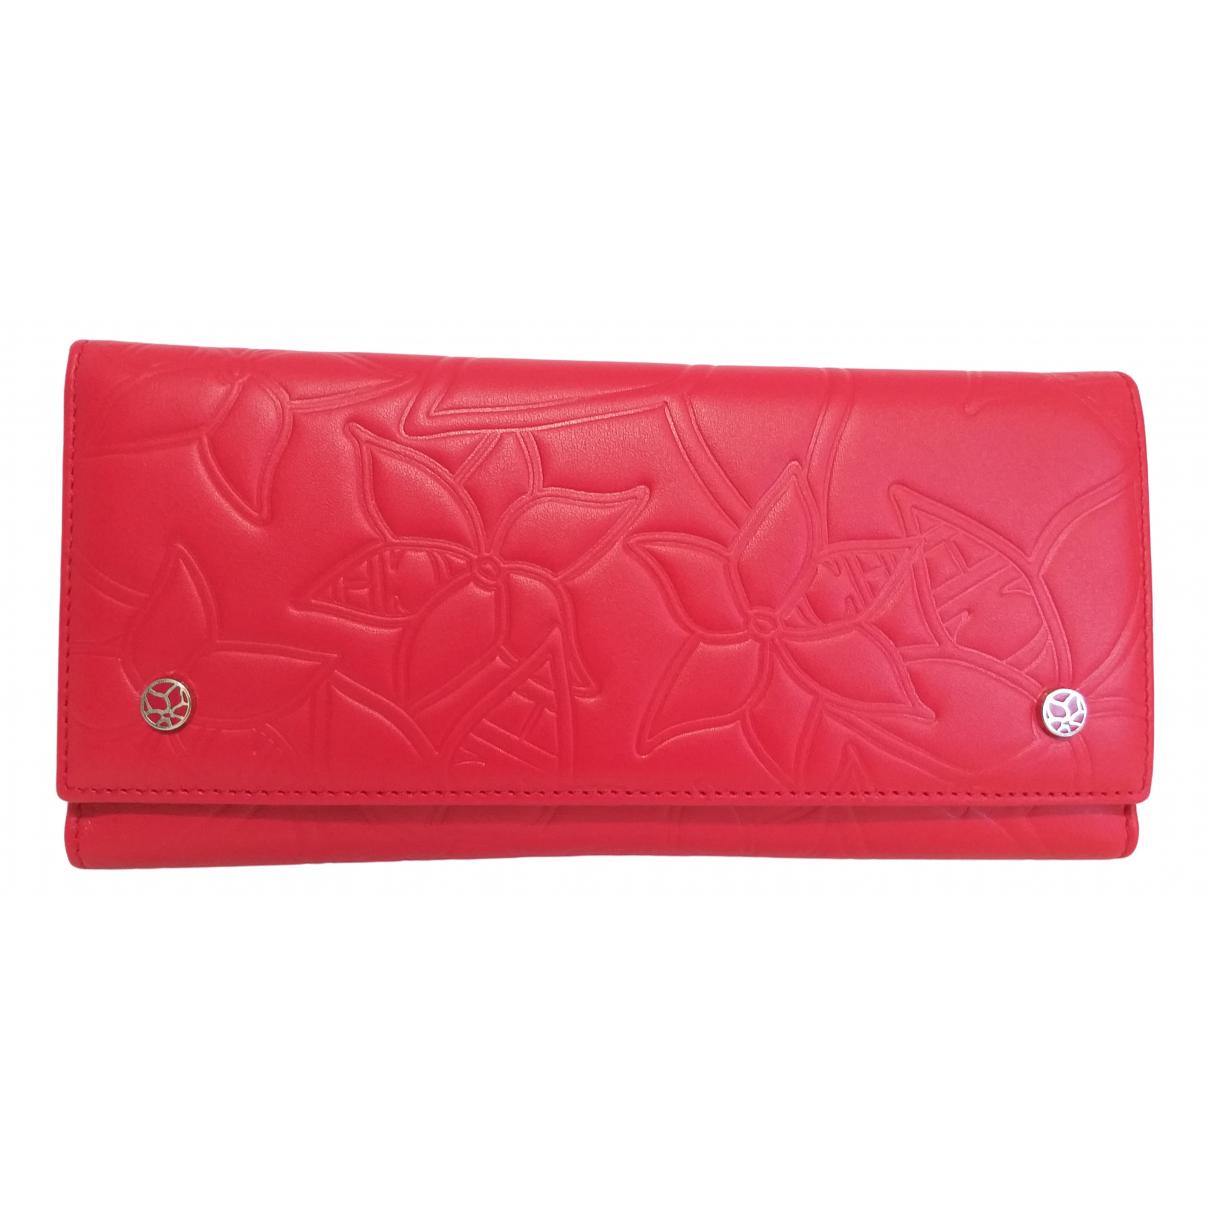 Carolina Herrera - Portefeuille   pour femme en cuir - rouge